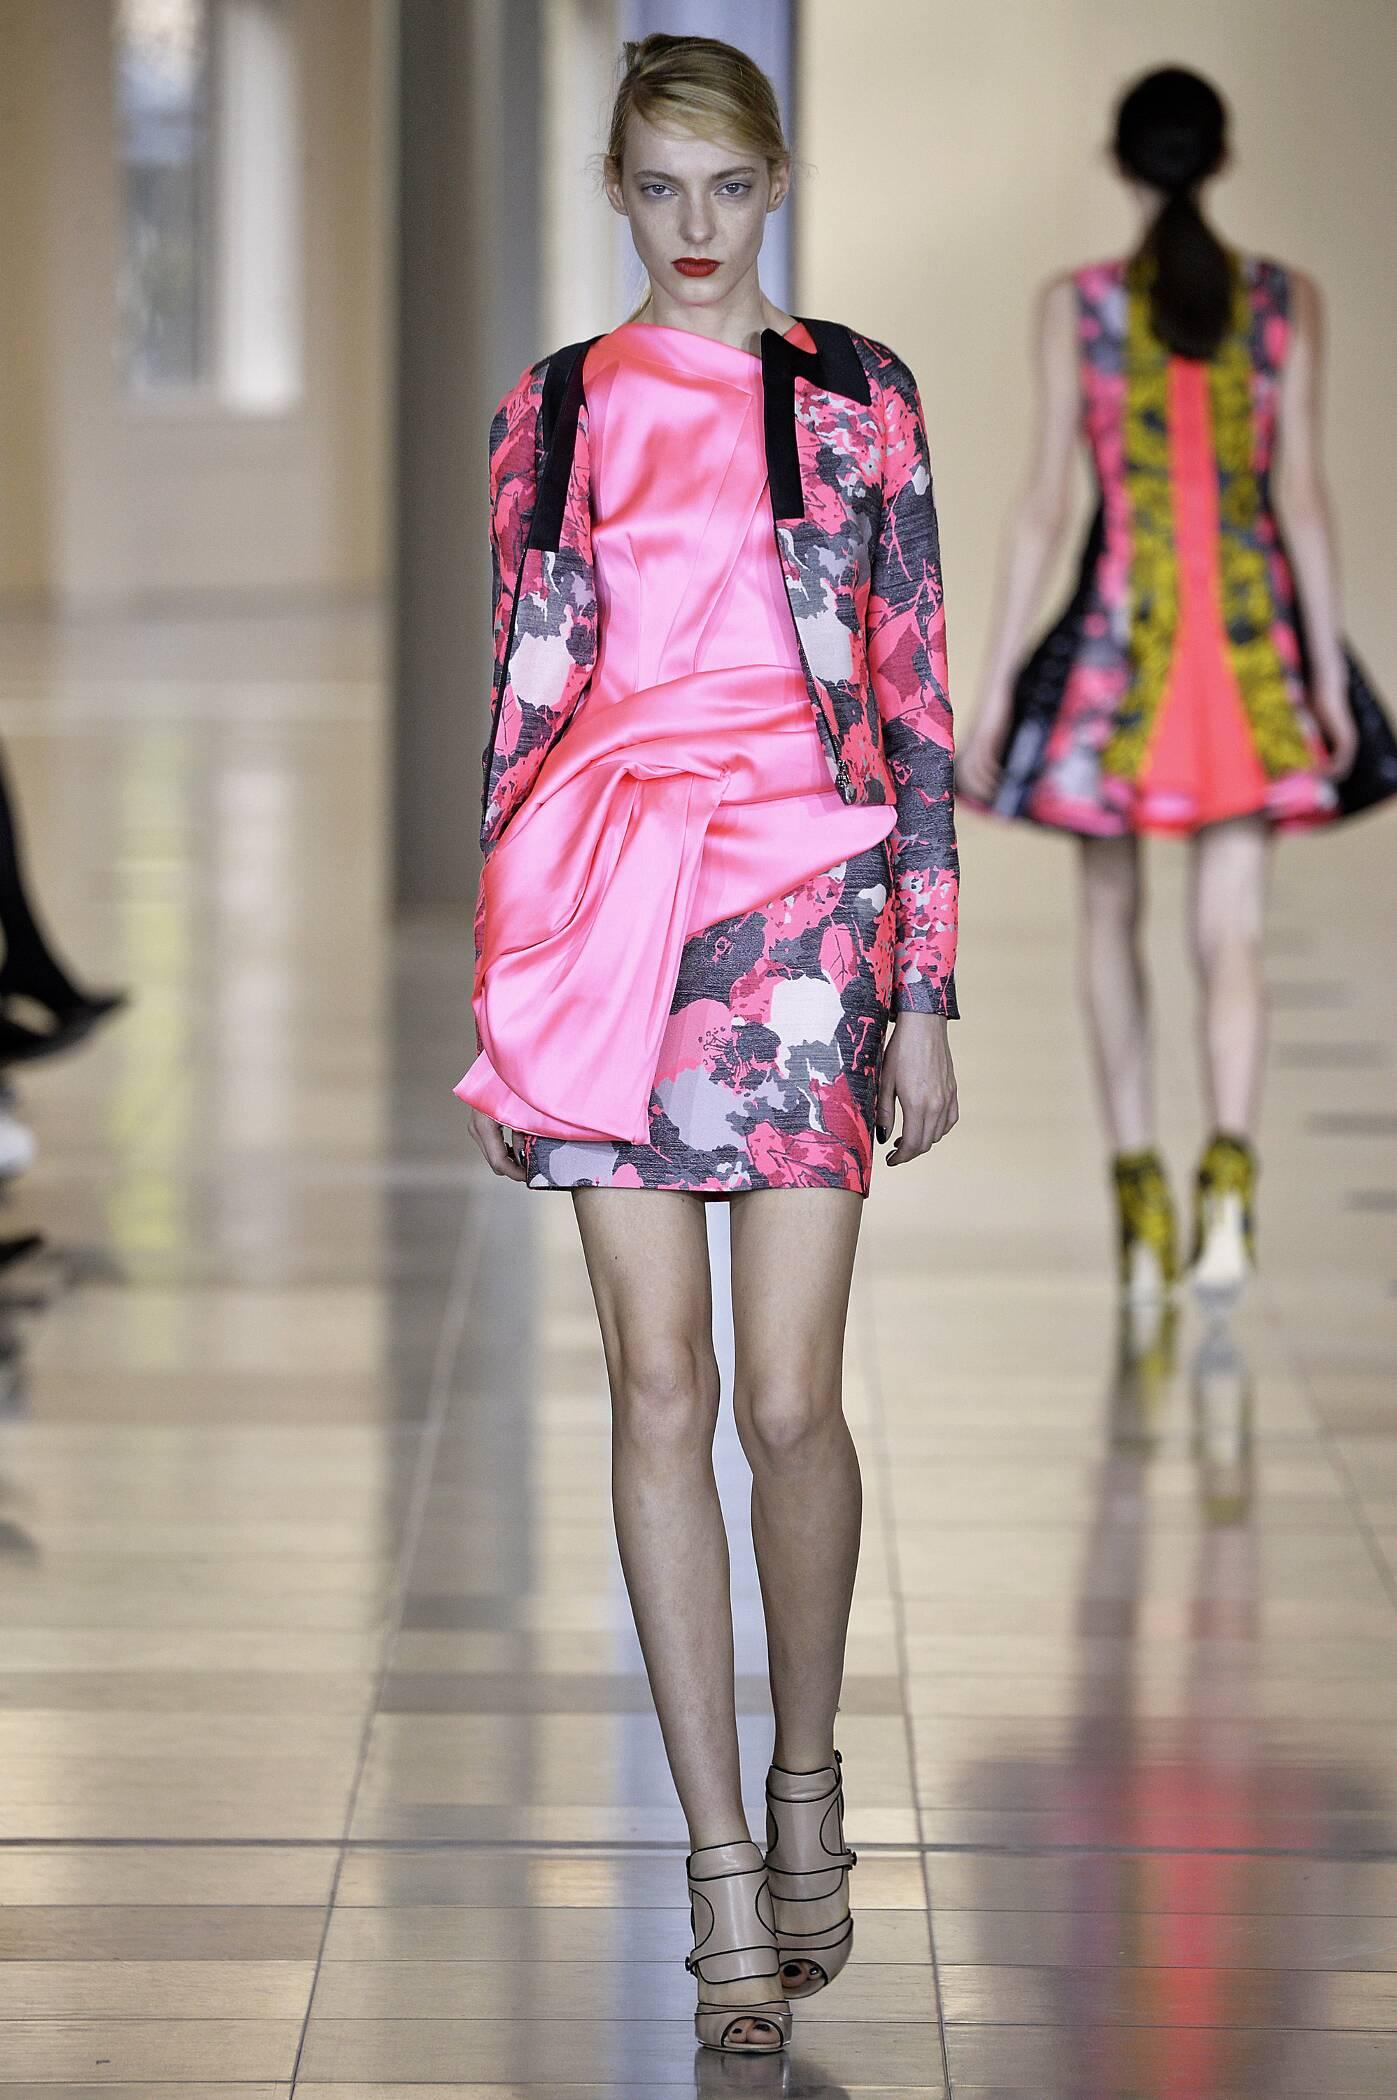 Antonio Berardi Fall Winter 2015 16 Womenswear Collection London Fashion Week Fashion Show